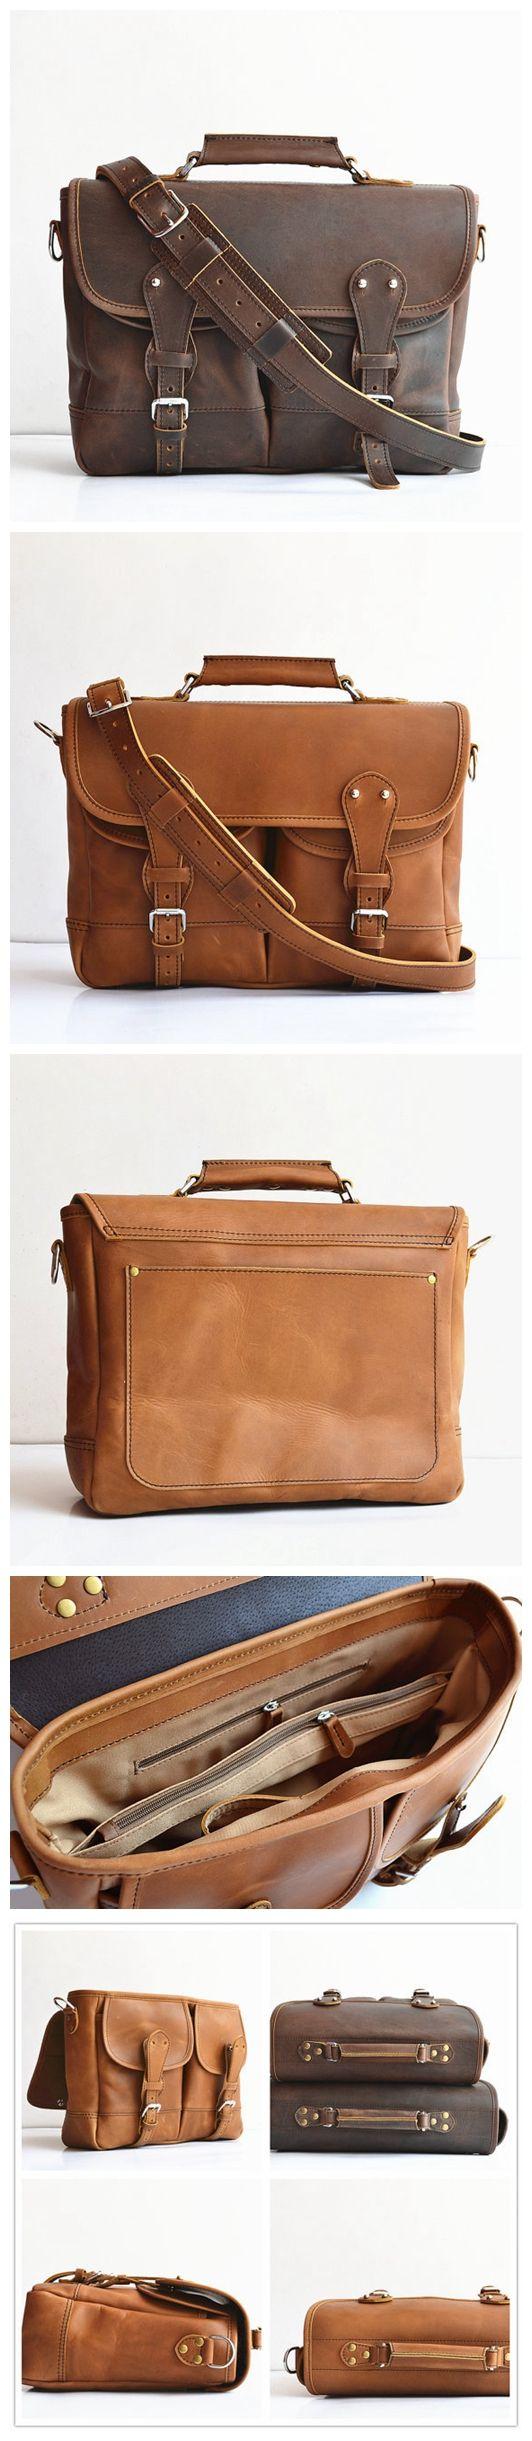 Handmade Men's Leather Briefcase Leather Angler Bag Fisher Man Bag Leather Messenger Bag Leather Satchel Leather MacBook Bag For Men Women